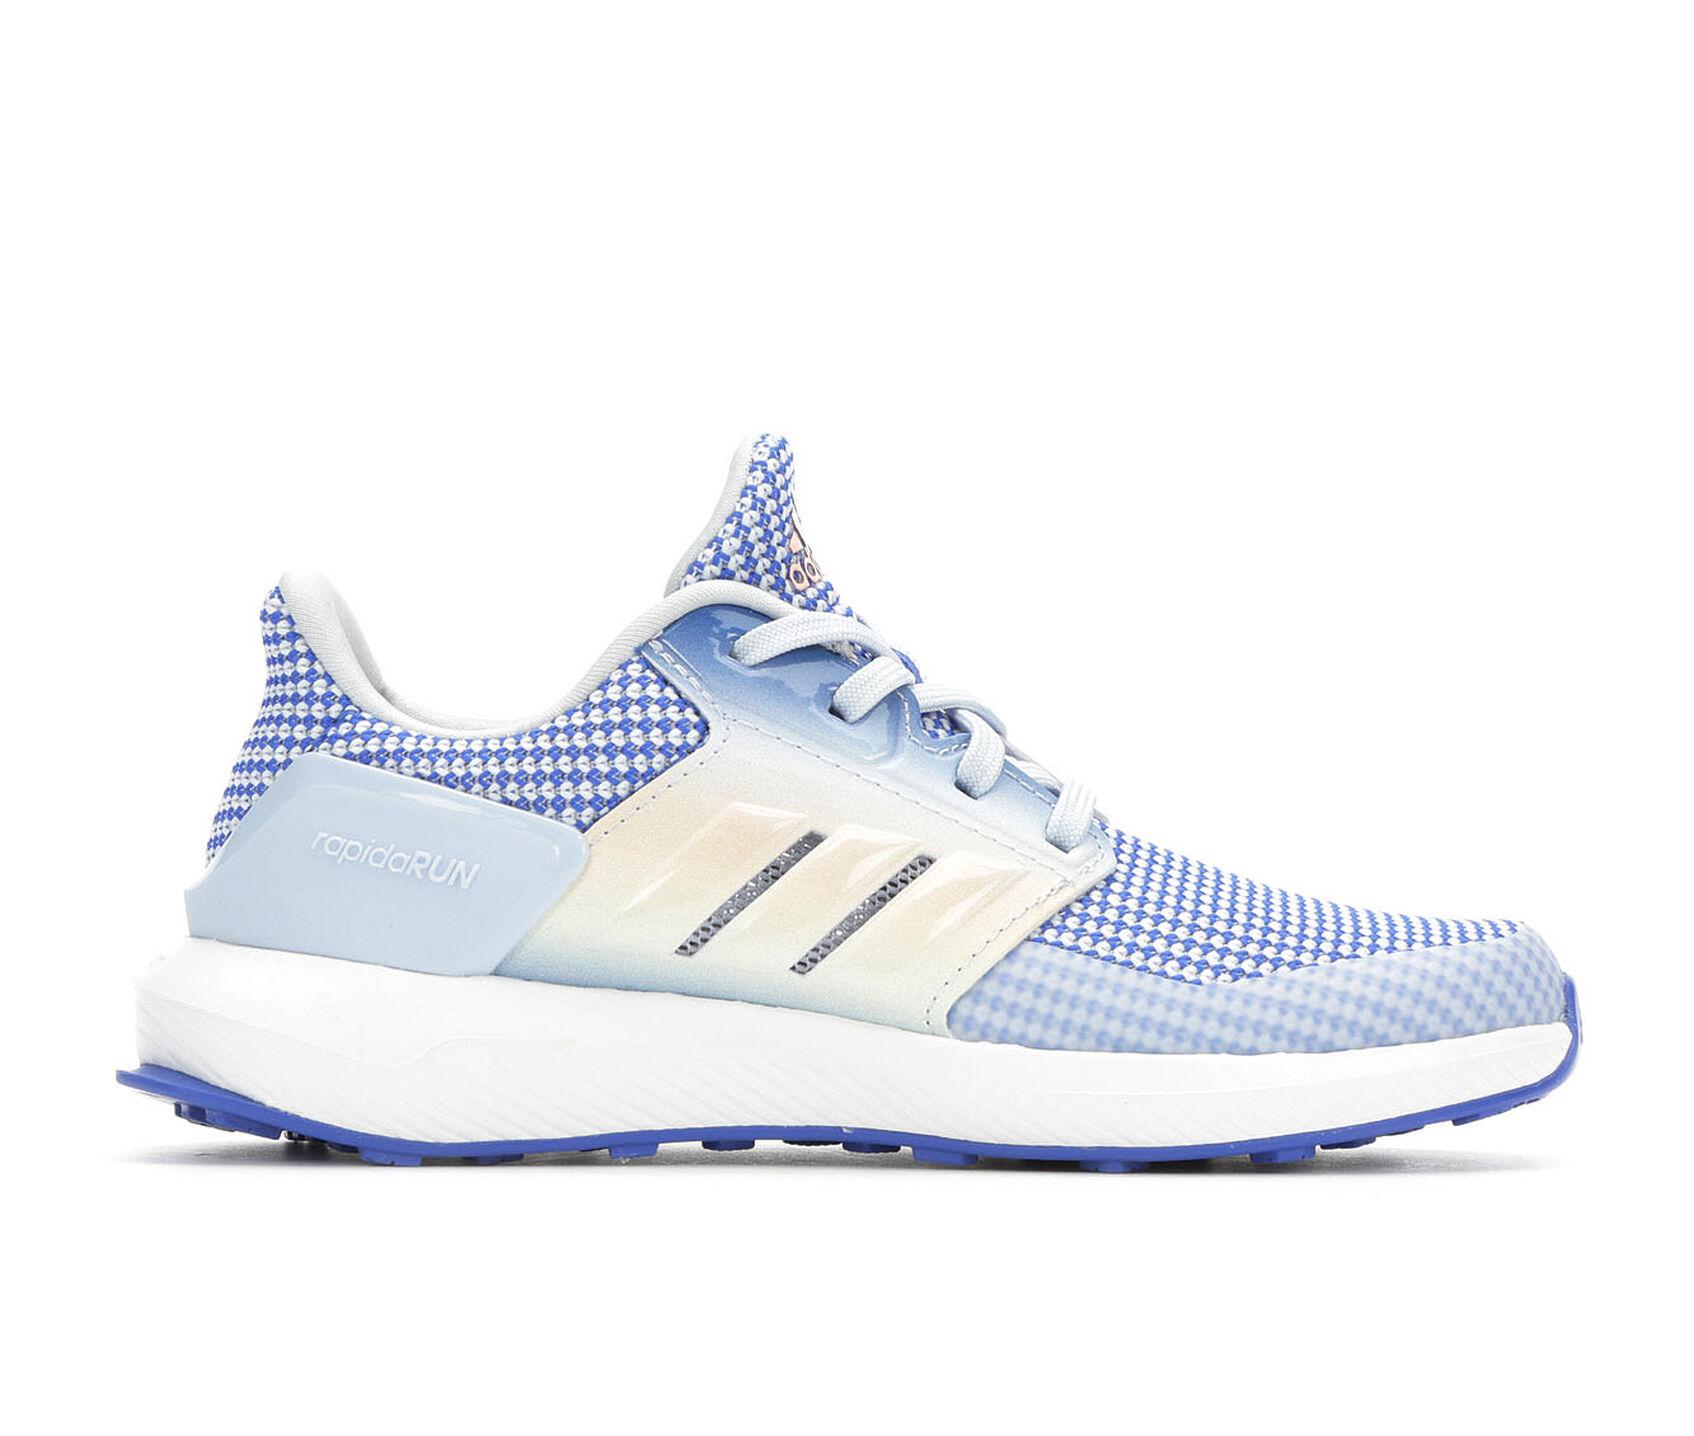 check out f3c75 c8546 Girls  Adidas Little Kid   Big Kid Rapidrun K Running Shoes   Shoe ...